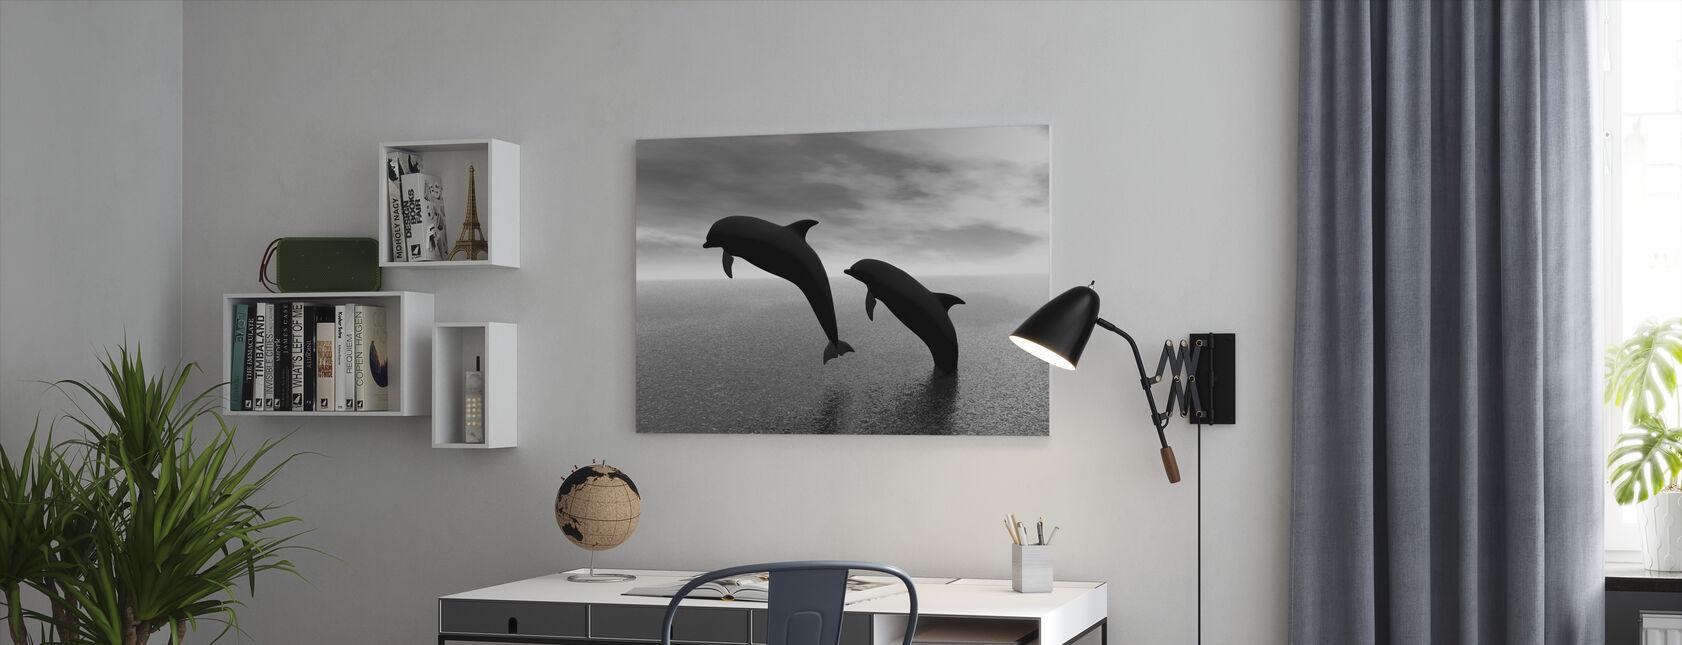 Delfinsilhuetter - b/w - Lerretsbilde - Kontor